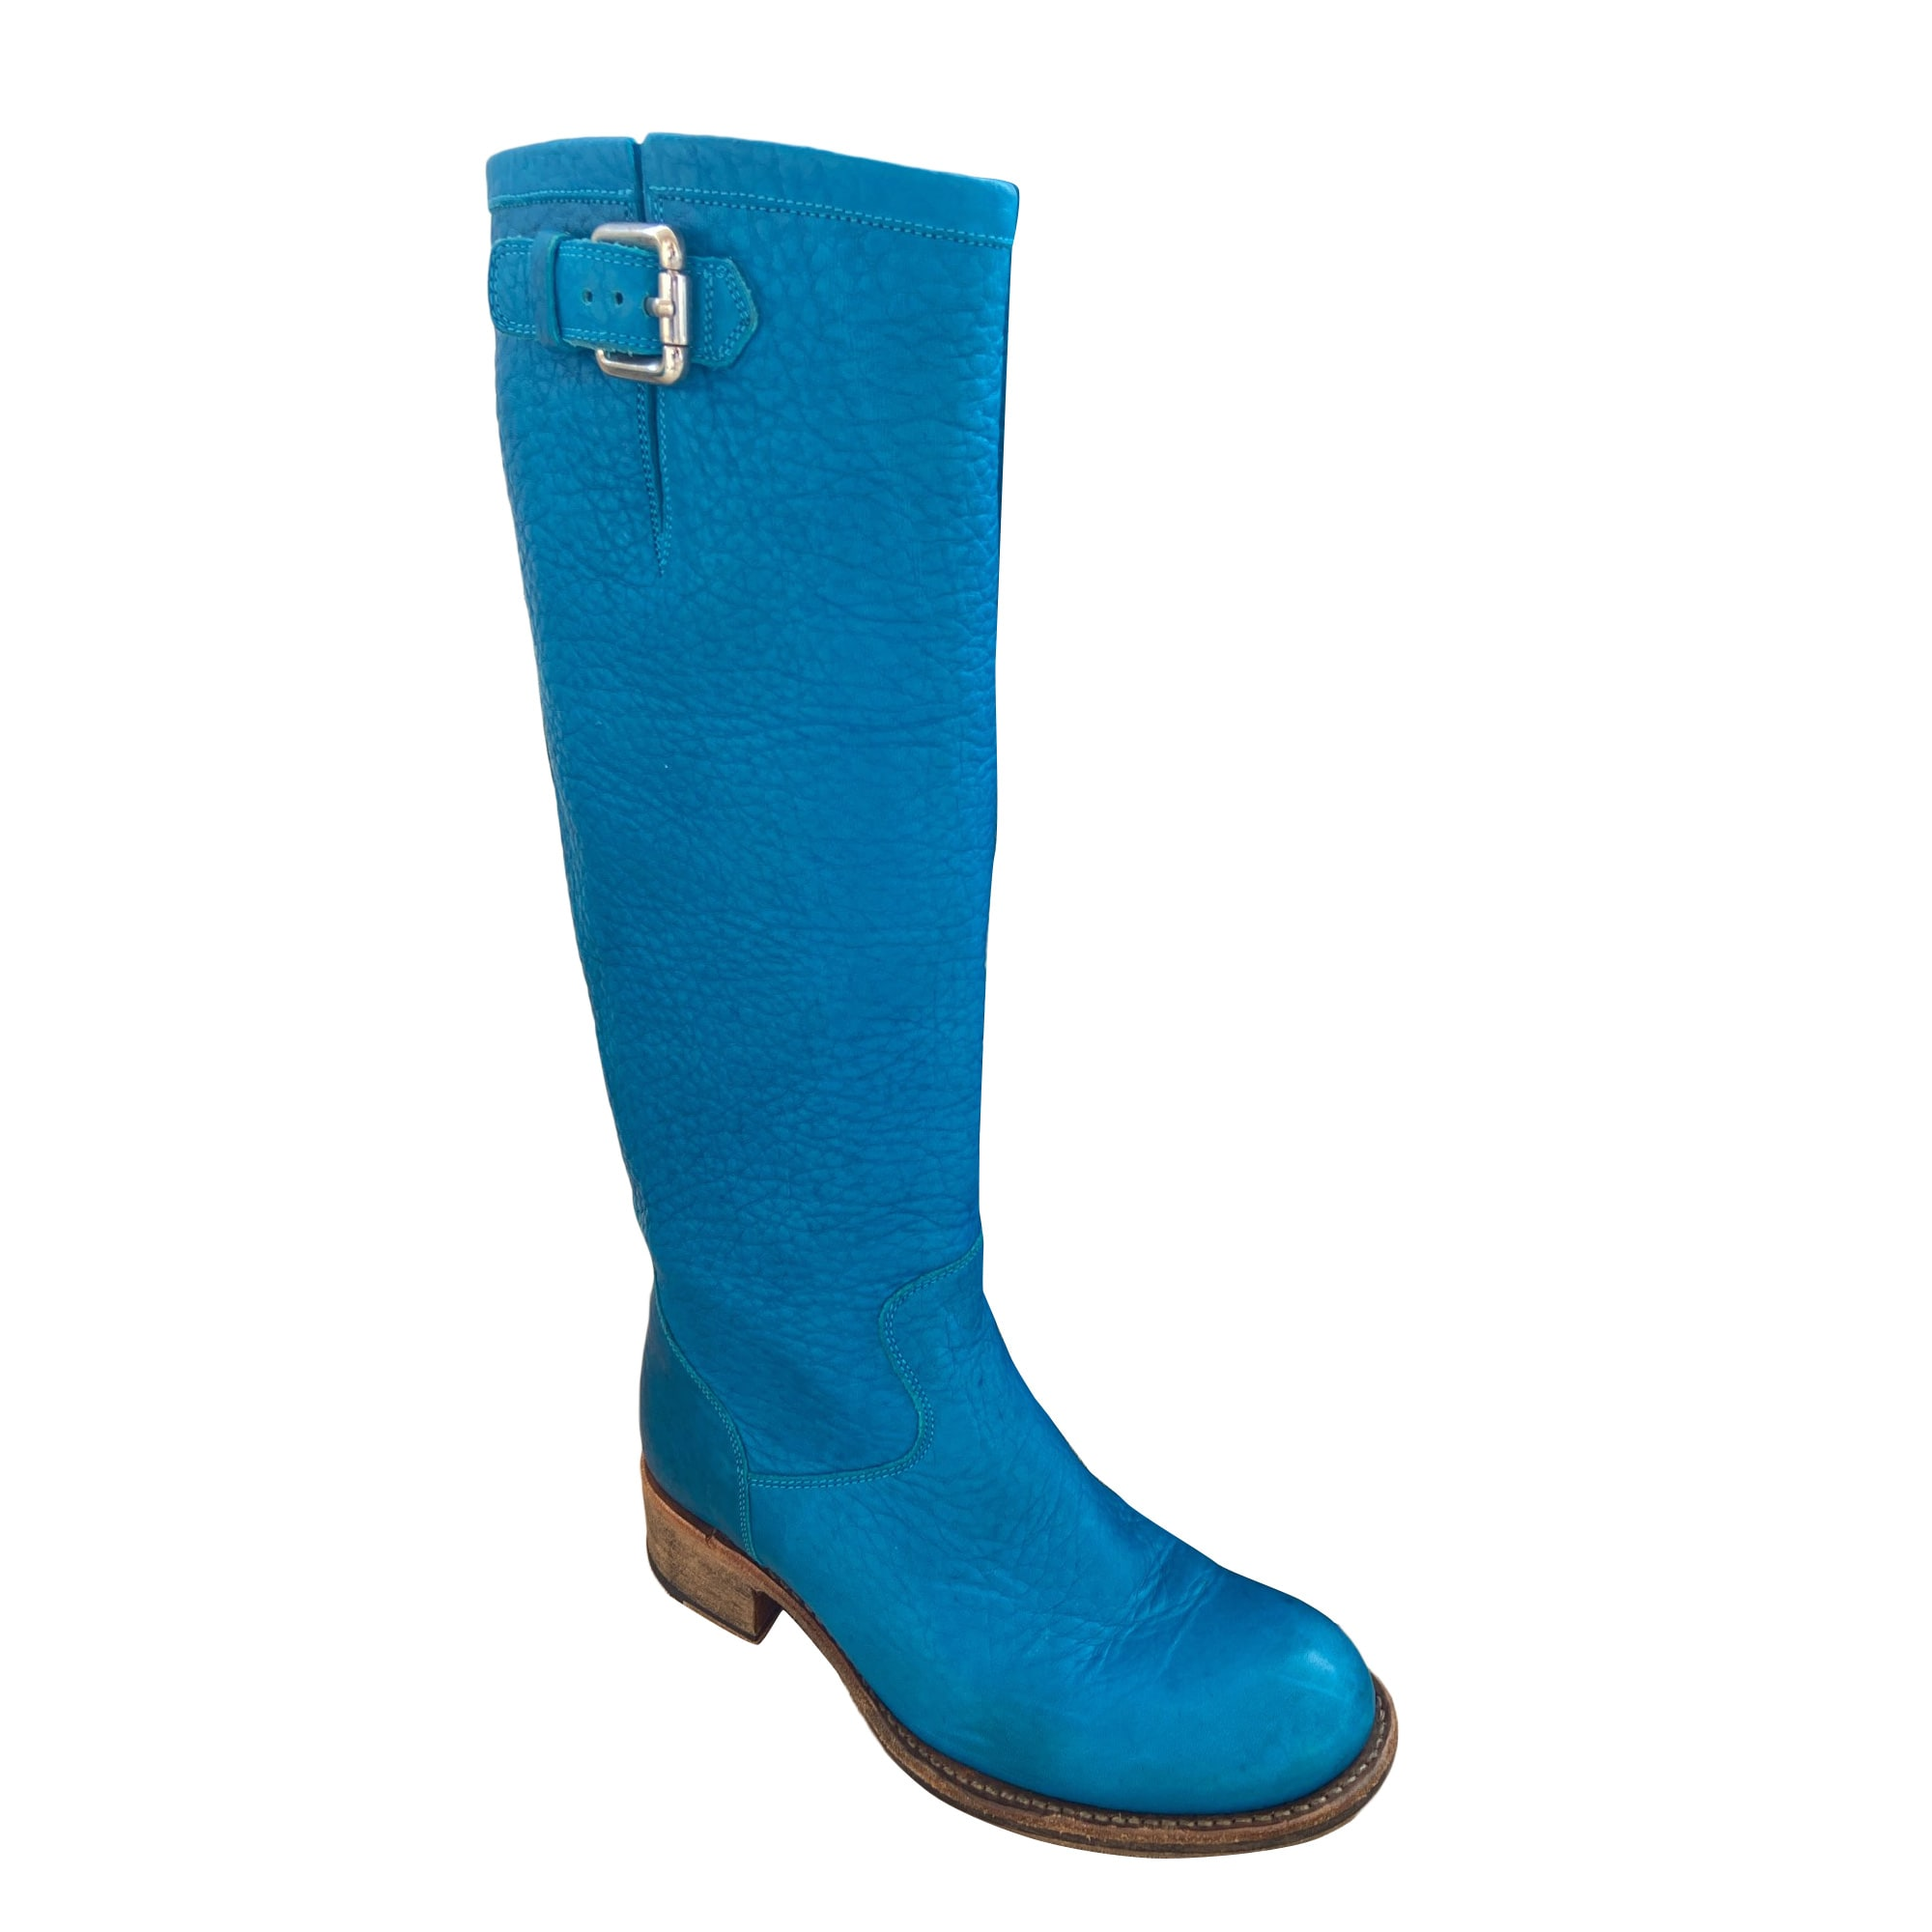 Bottes cavalières FREE LANCE Bleu, bleu marine, bleu turquoise